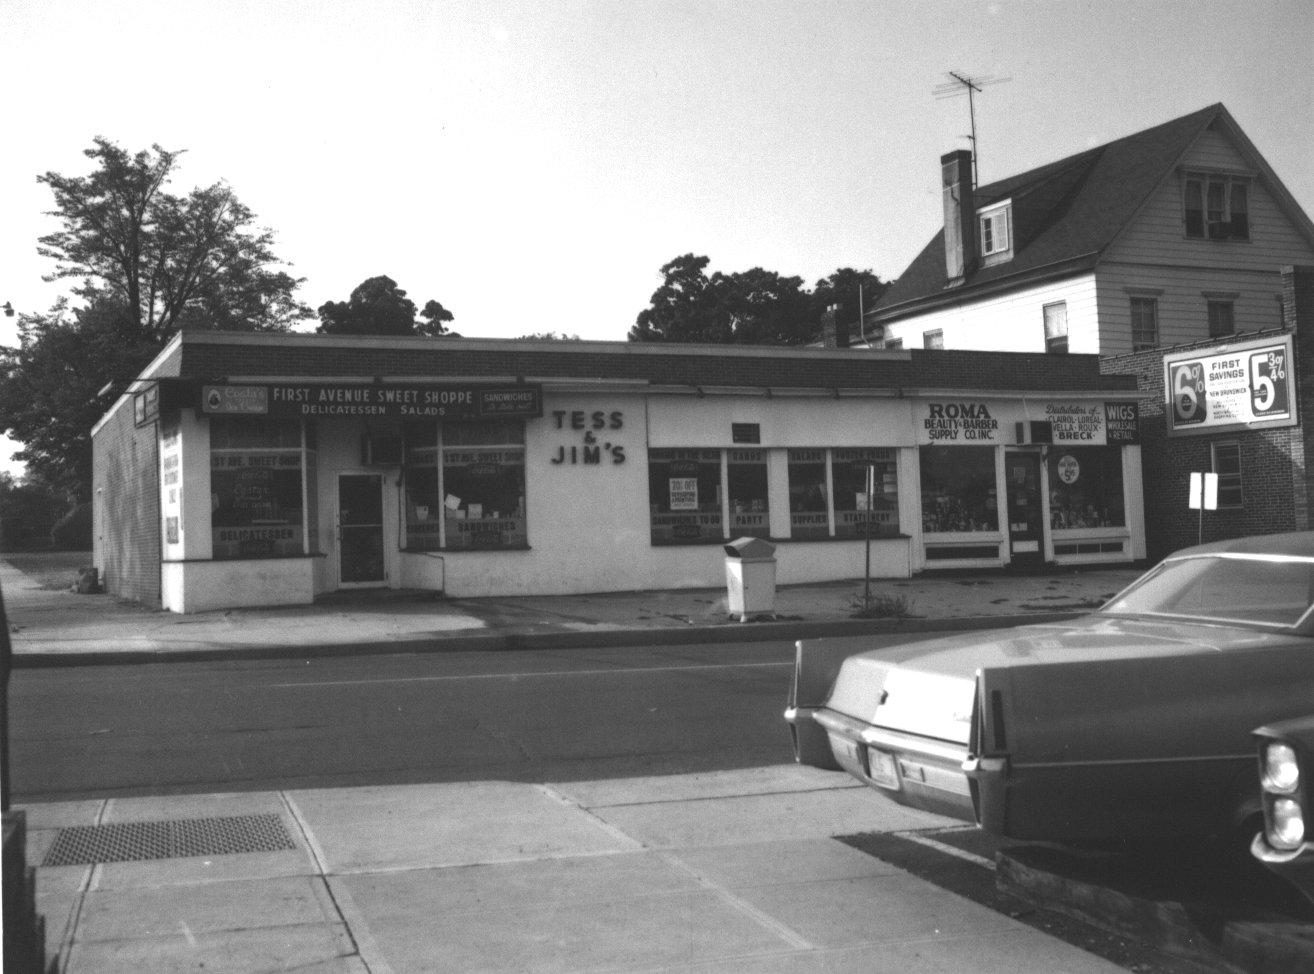 As a sweet shop in 1972